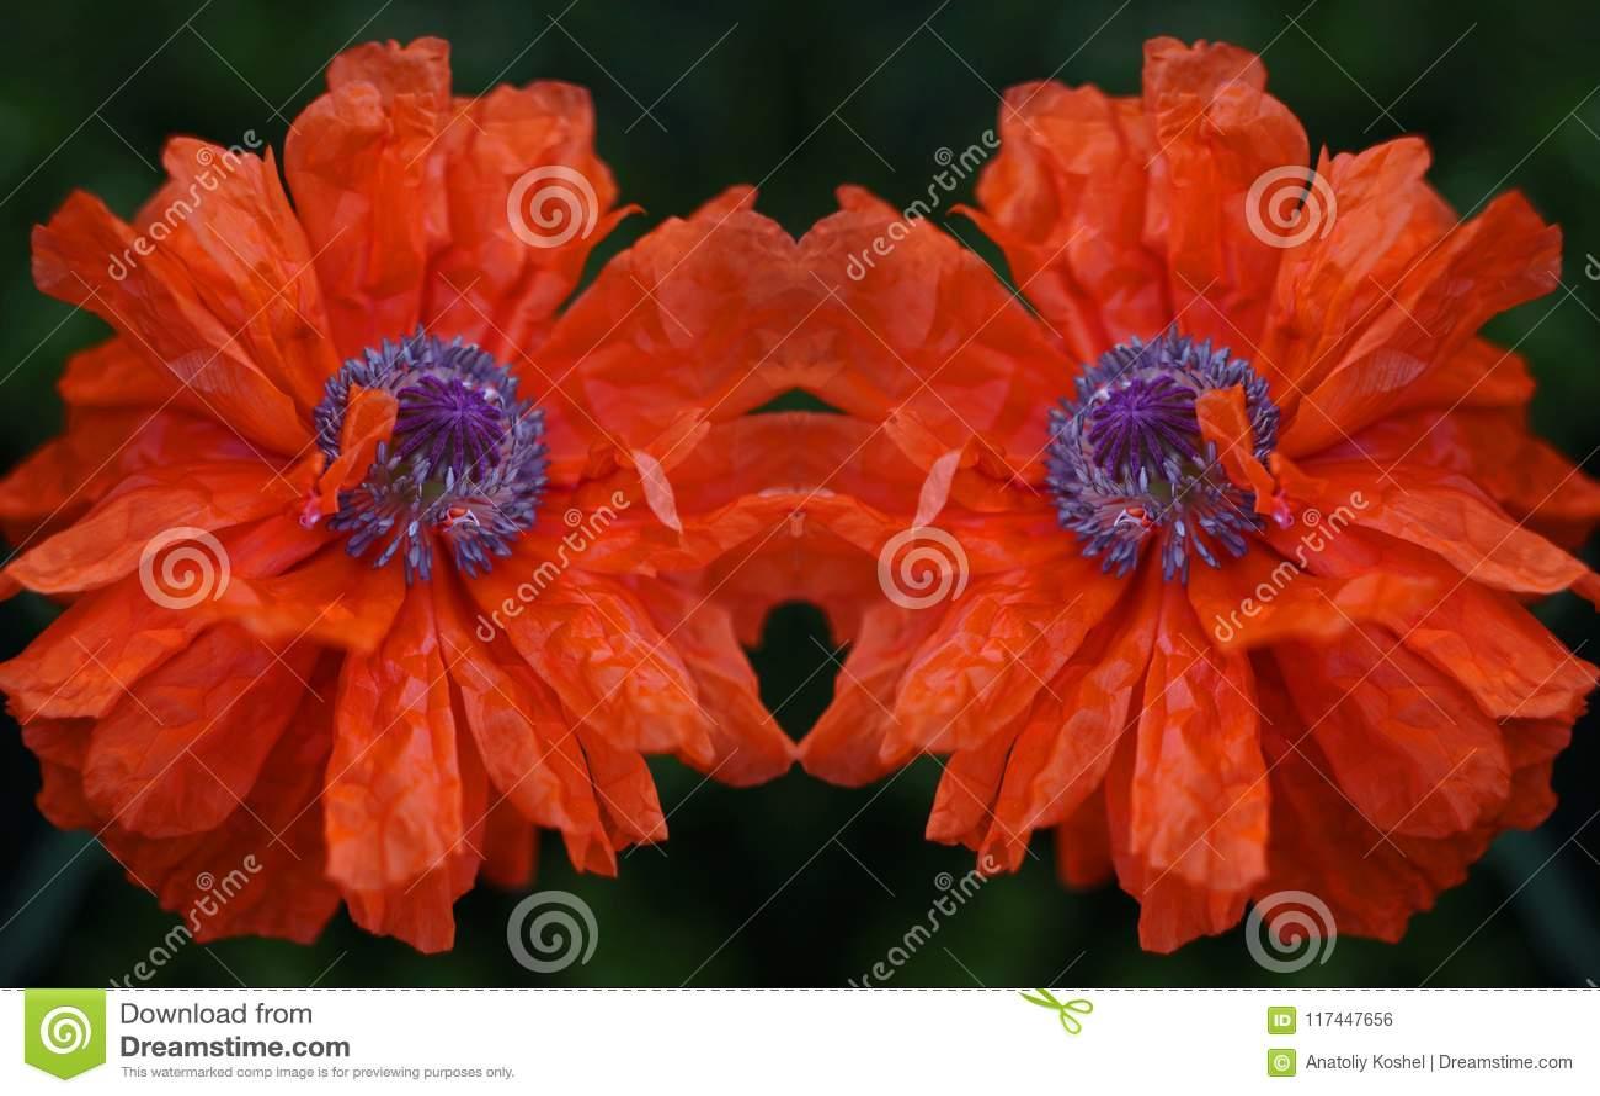 Poppy flower scarlet petals like sails stock photo image of poppy flower scarlet petals like sails mightylinksfo